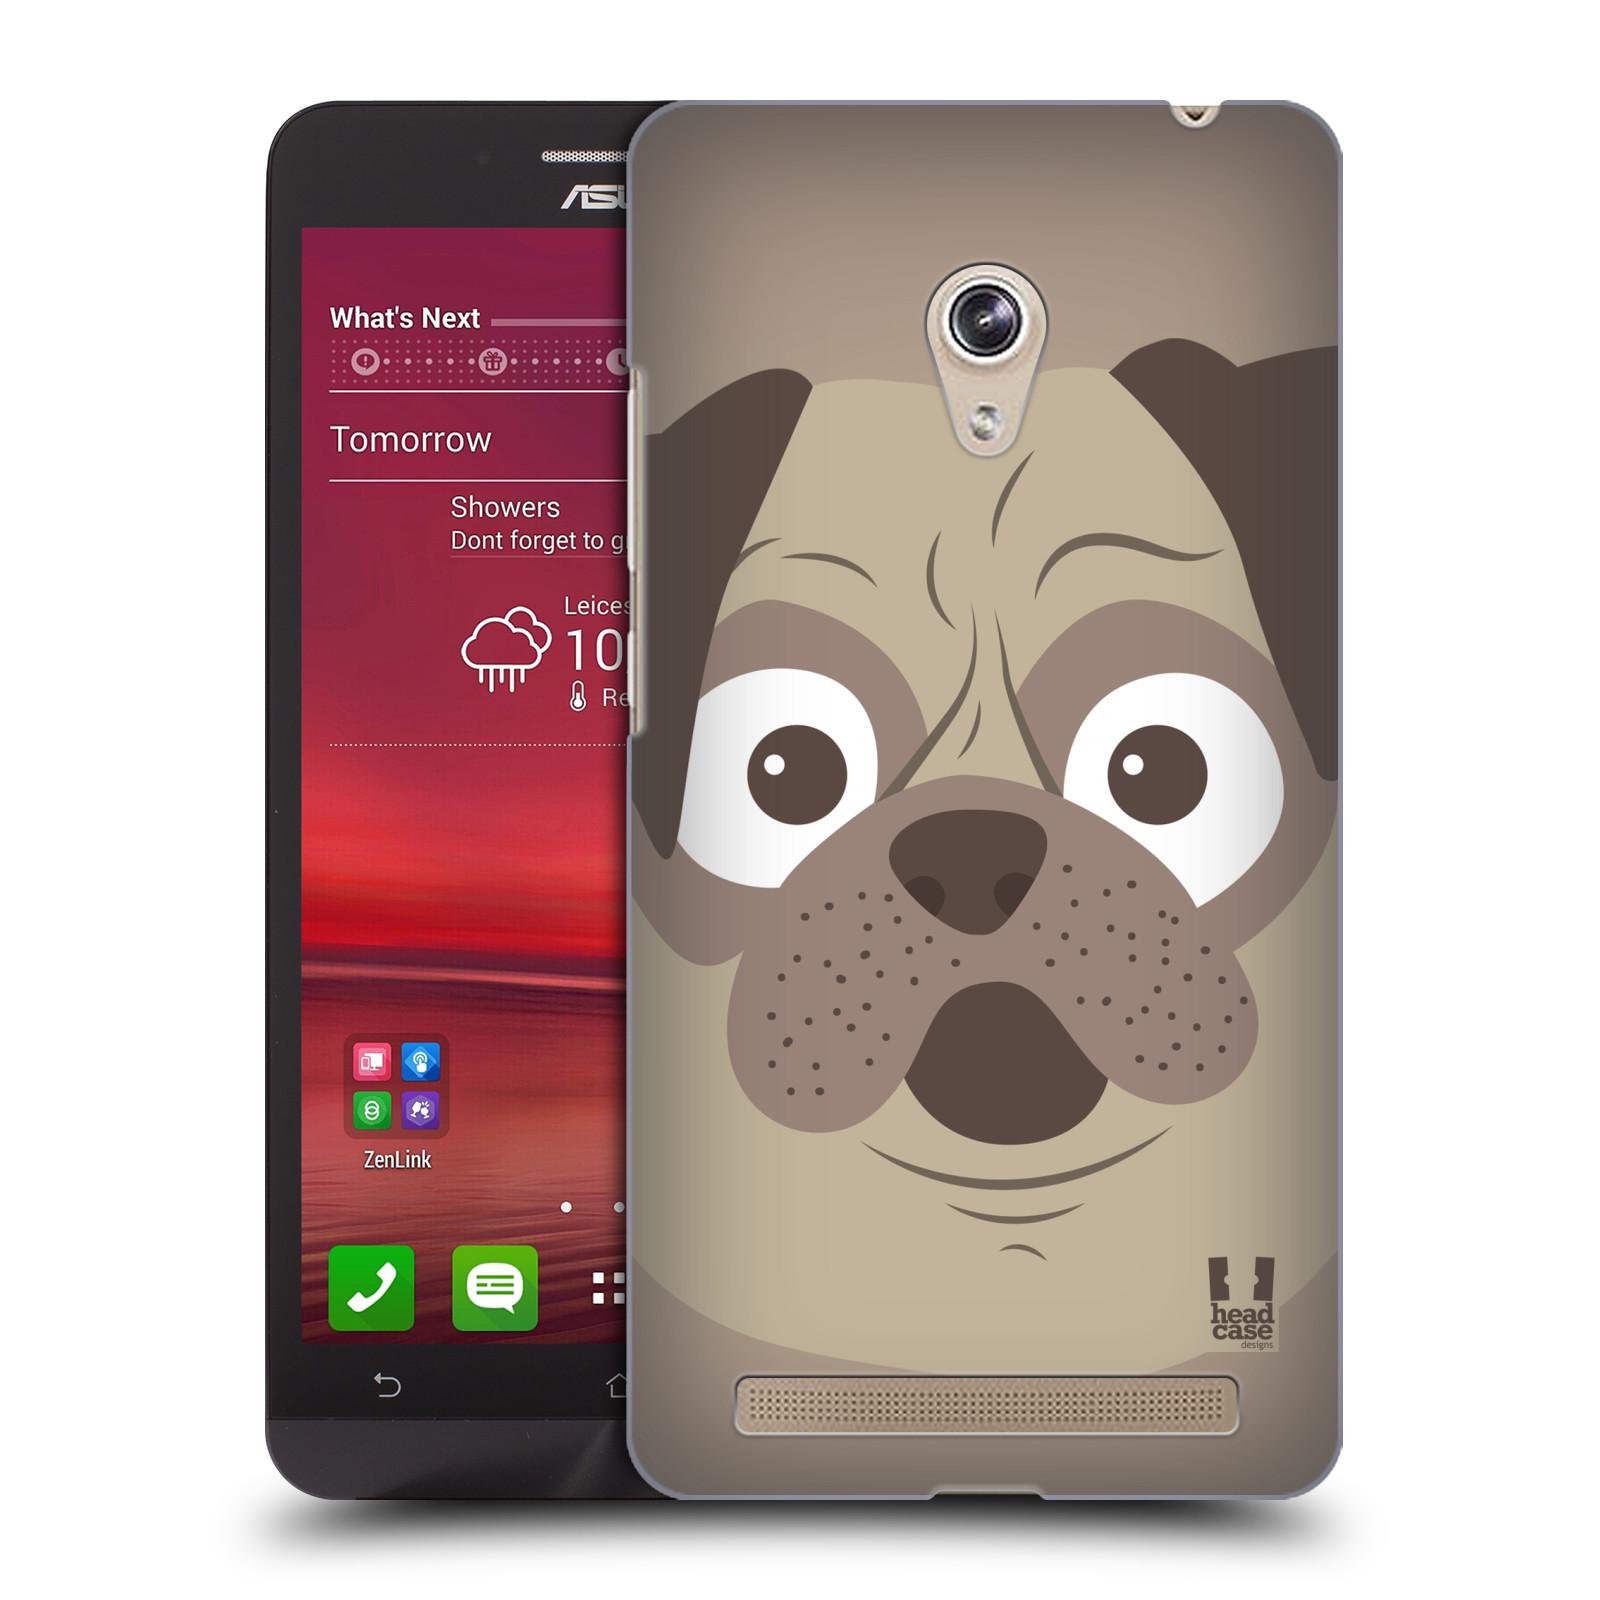 HEAD CASE plastový obal na mobil Asus Zenfone 6 vzor Cartoon Karikatura barevná kreslená zvířátka pes mopsík